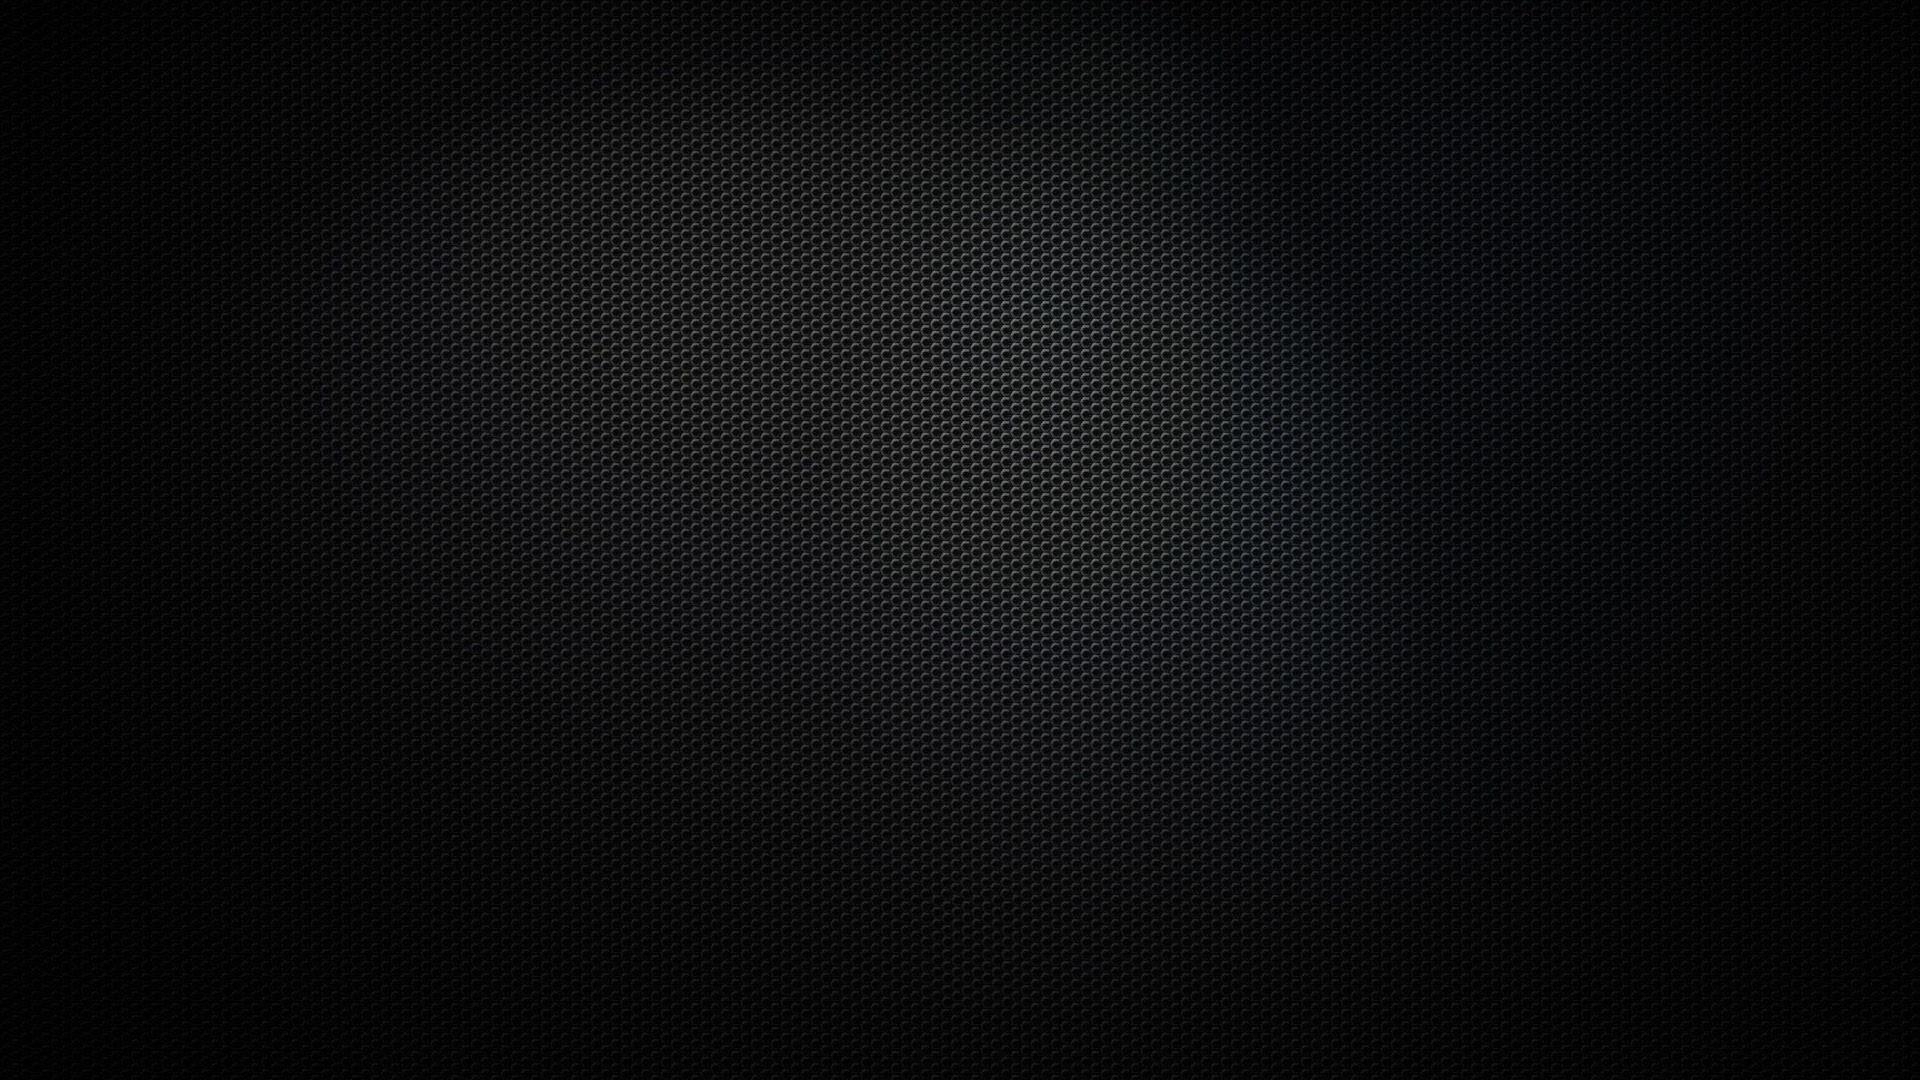 Download Art Black Background Download 1920x1080